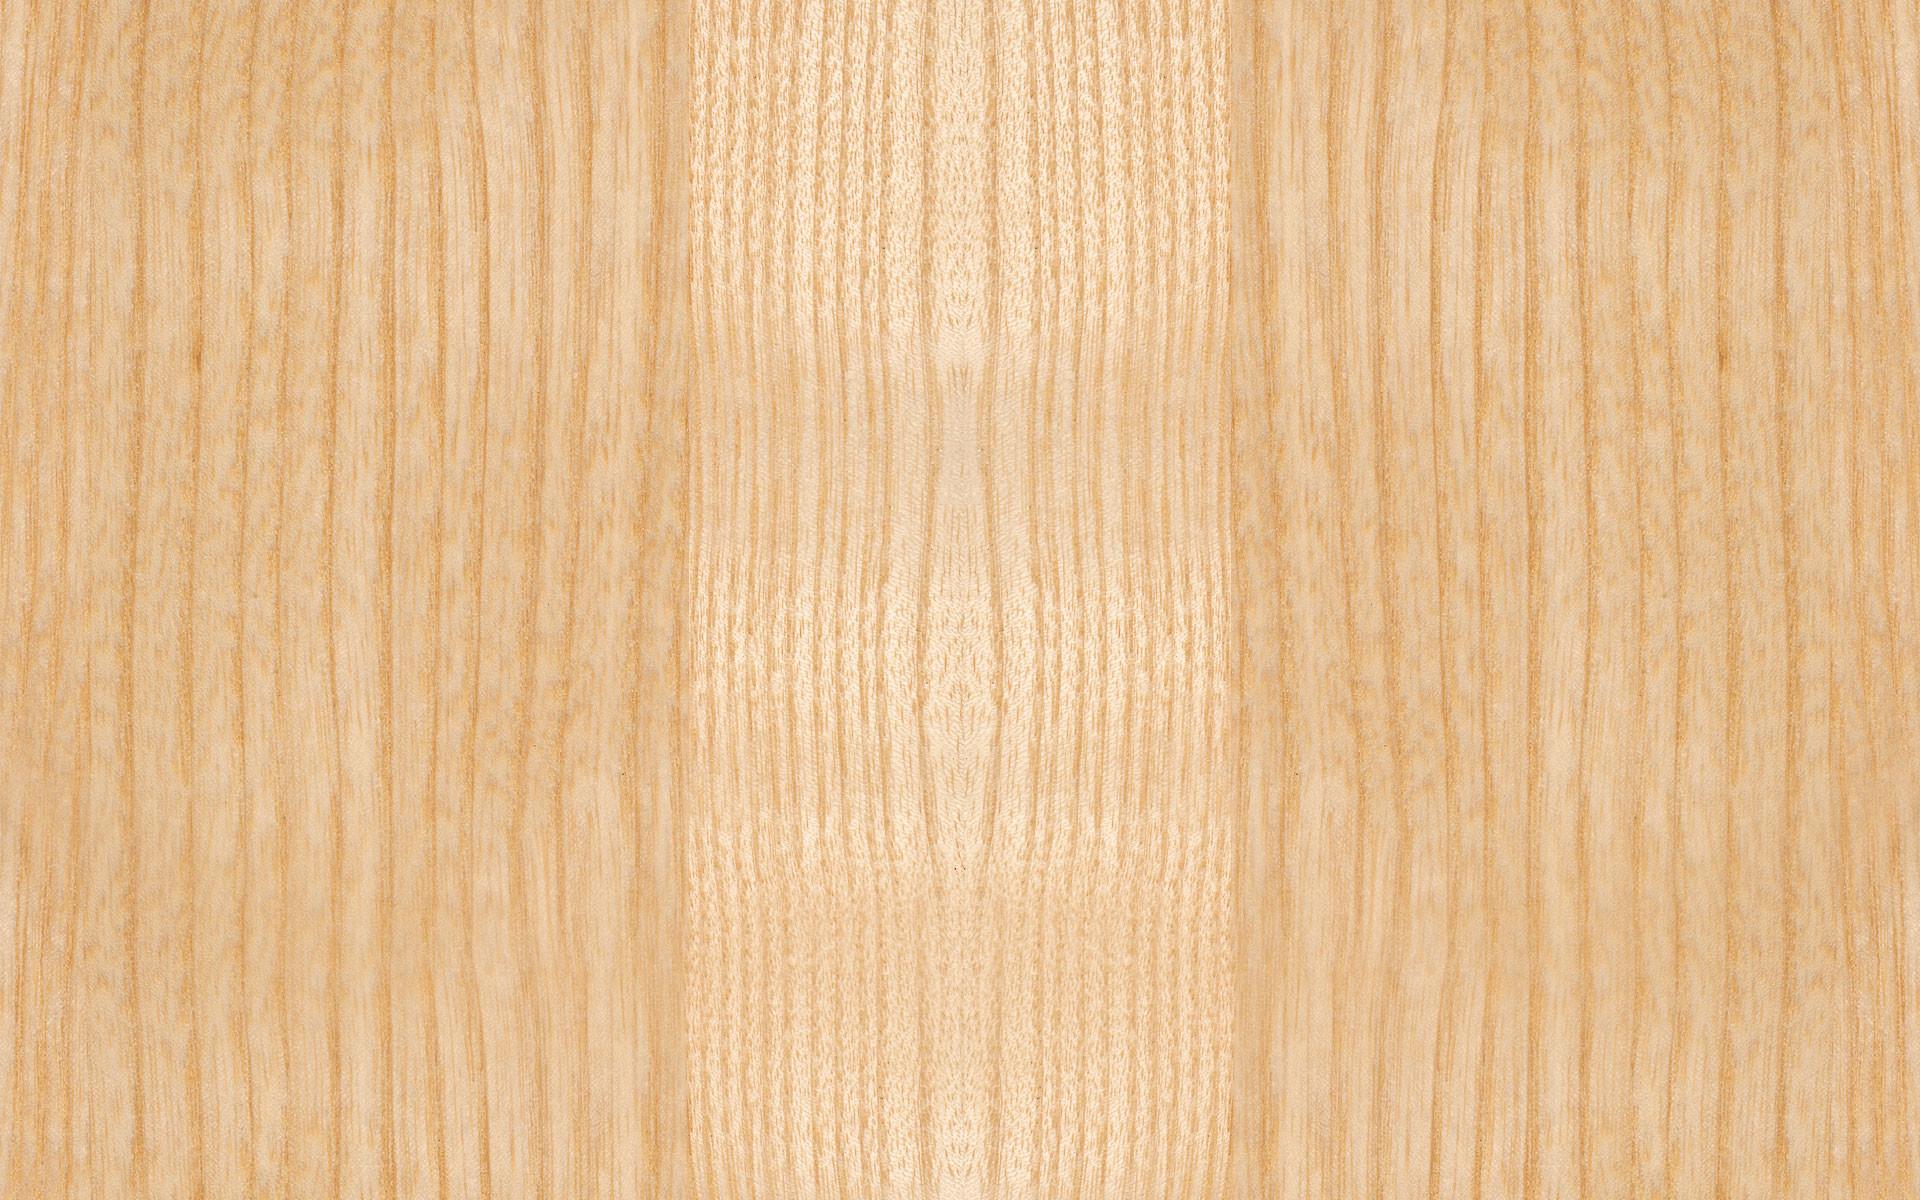 … Light Wood Grain Background